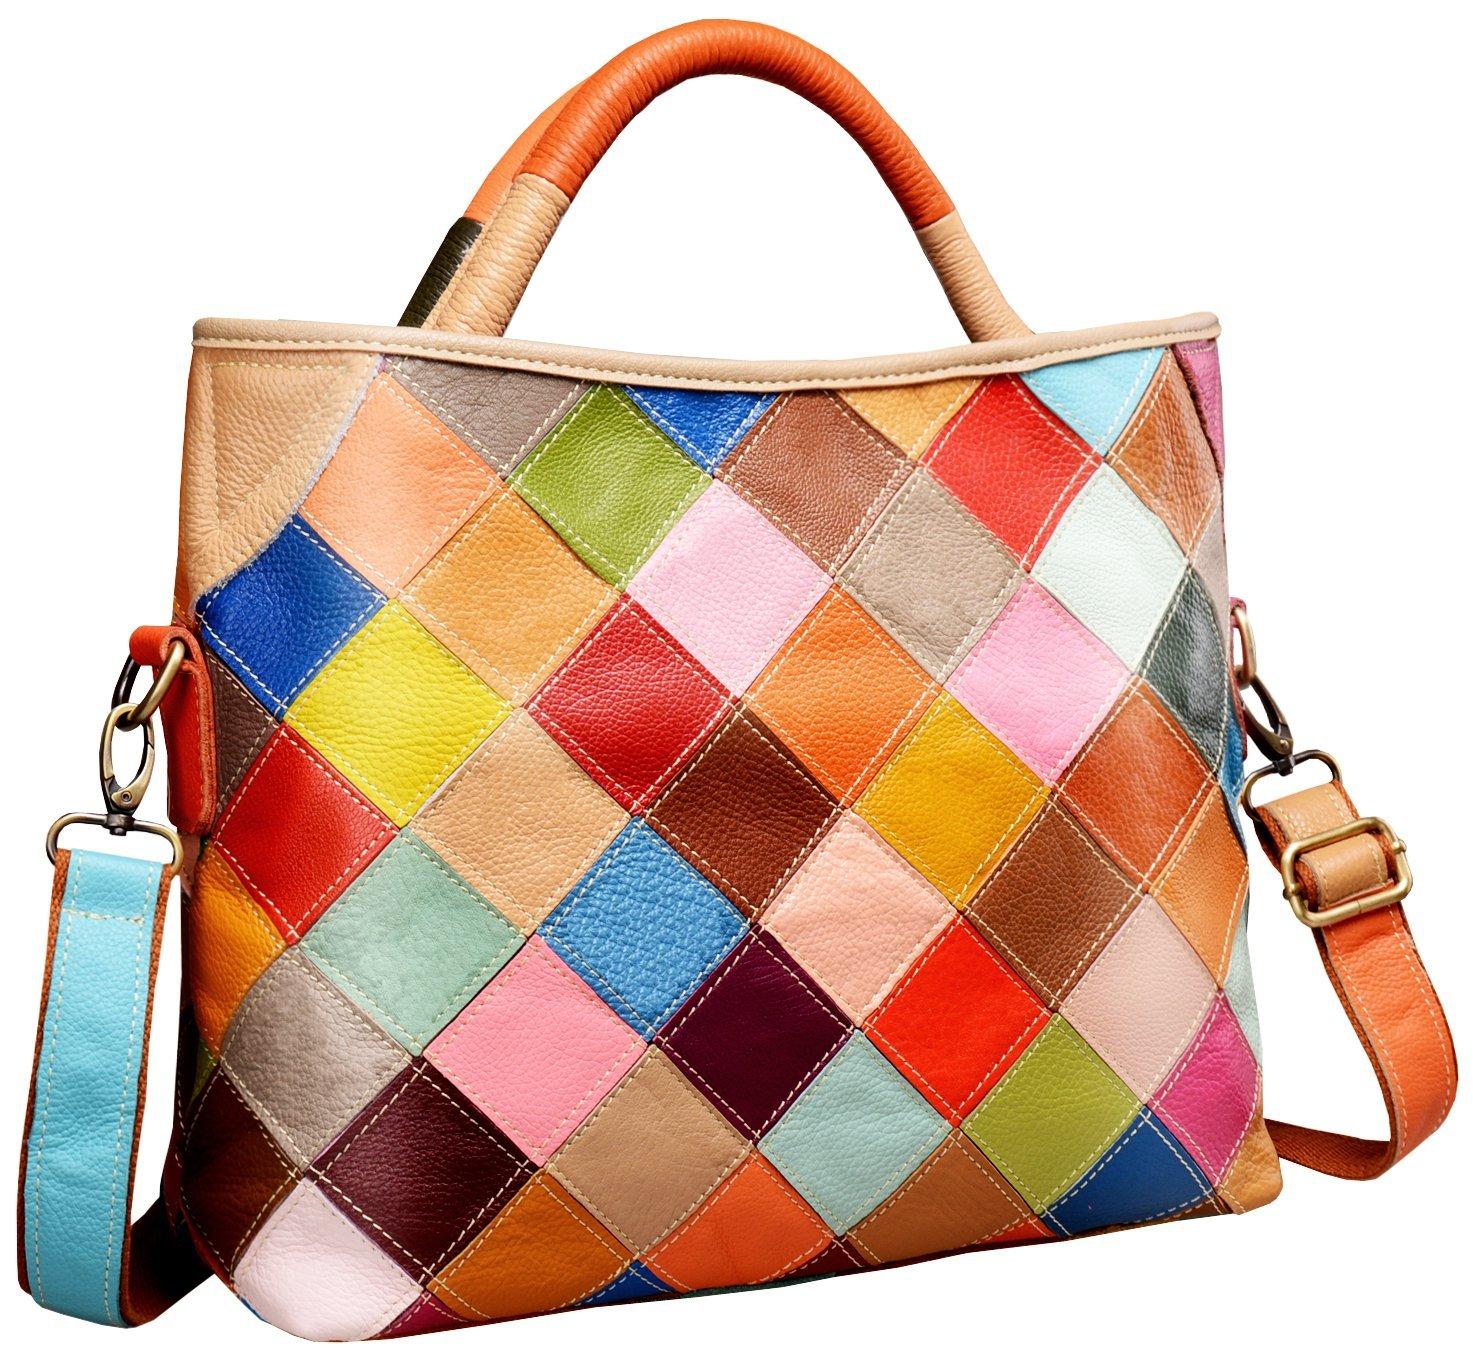 Heshe Women's Multi-color Shoulder Bag Hobo Tote Handbag Cross Body Purse (Colorful-2B4029)